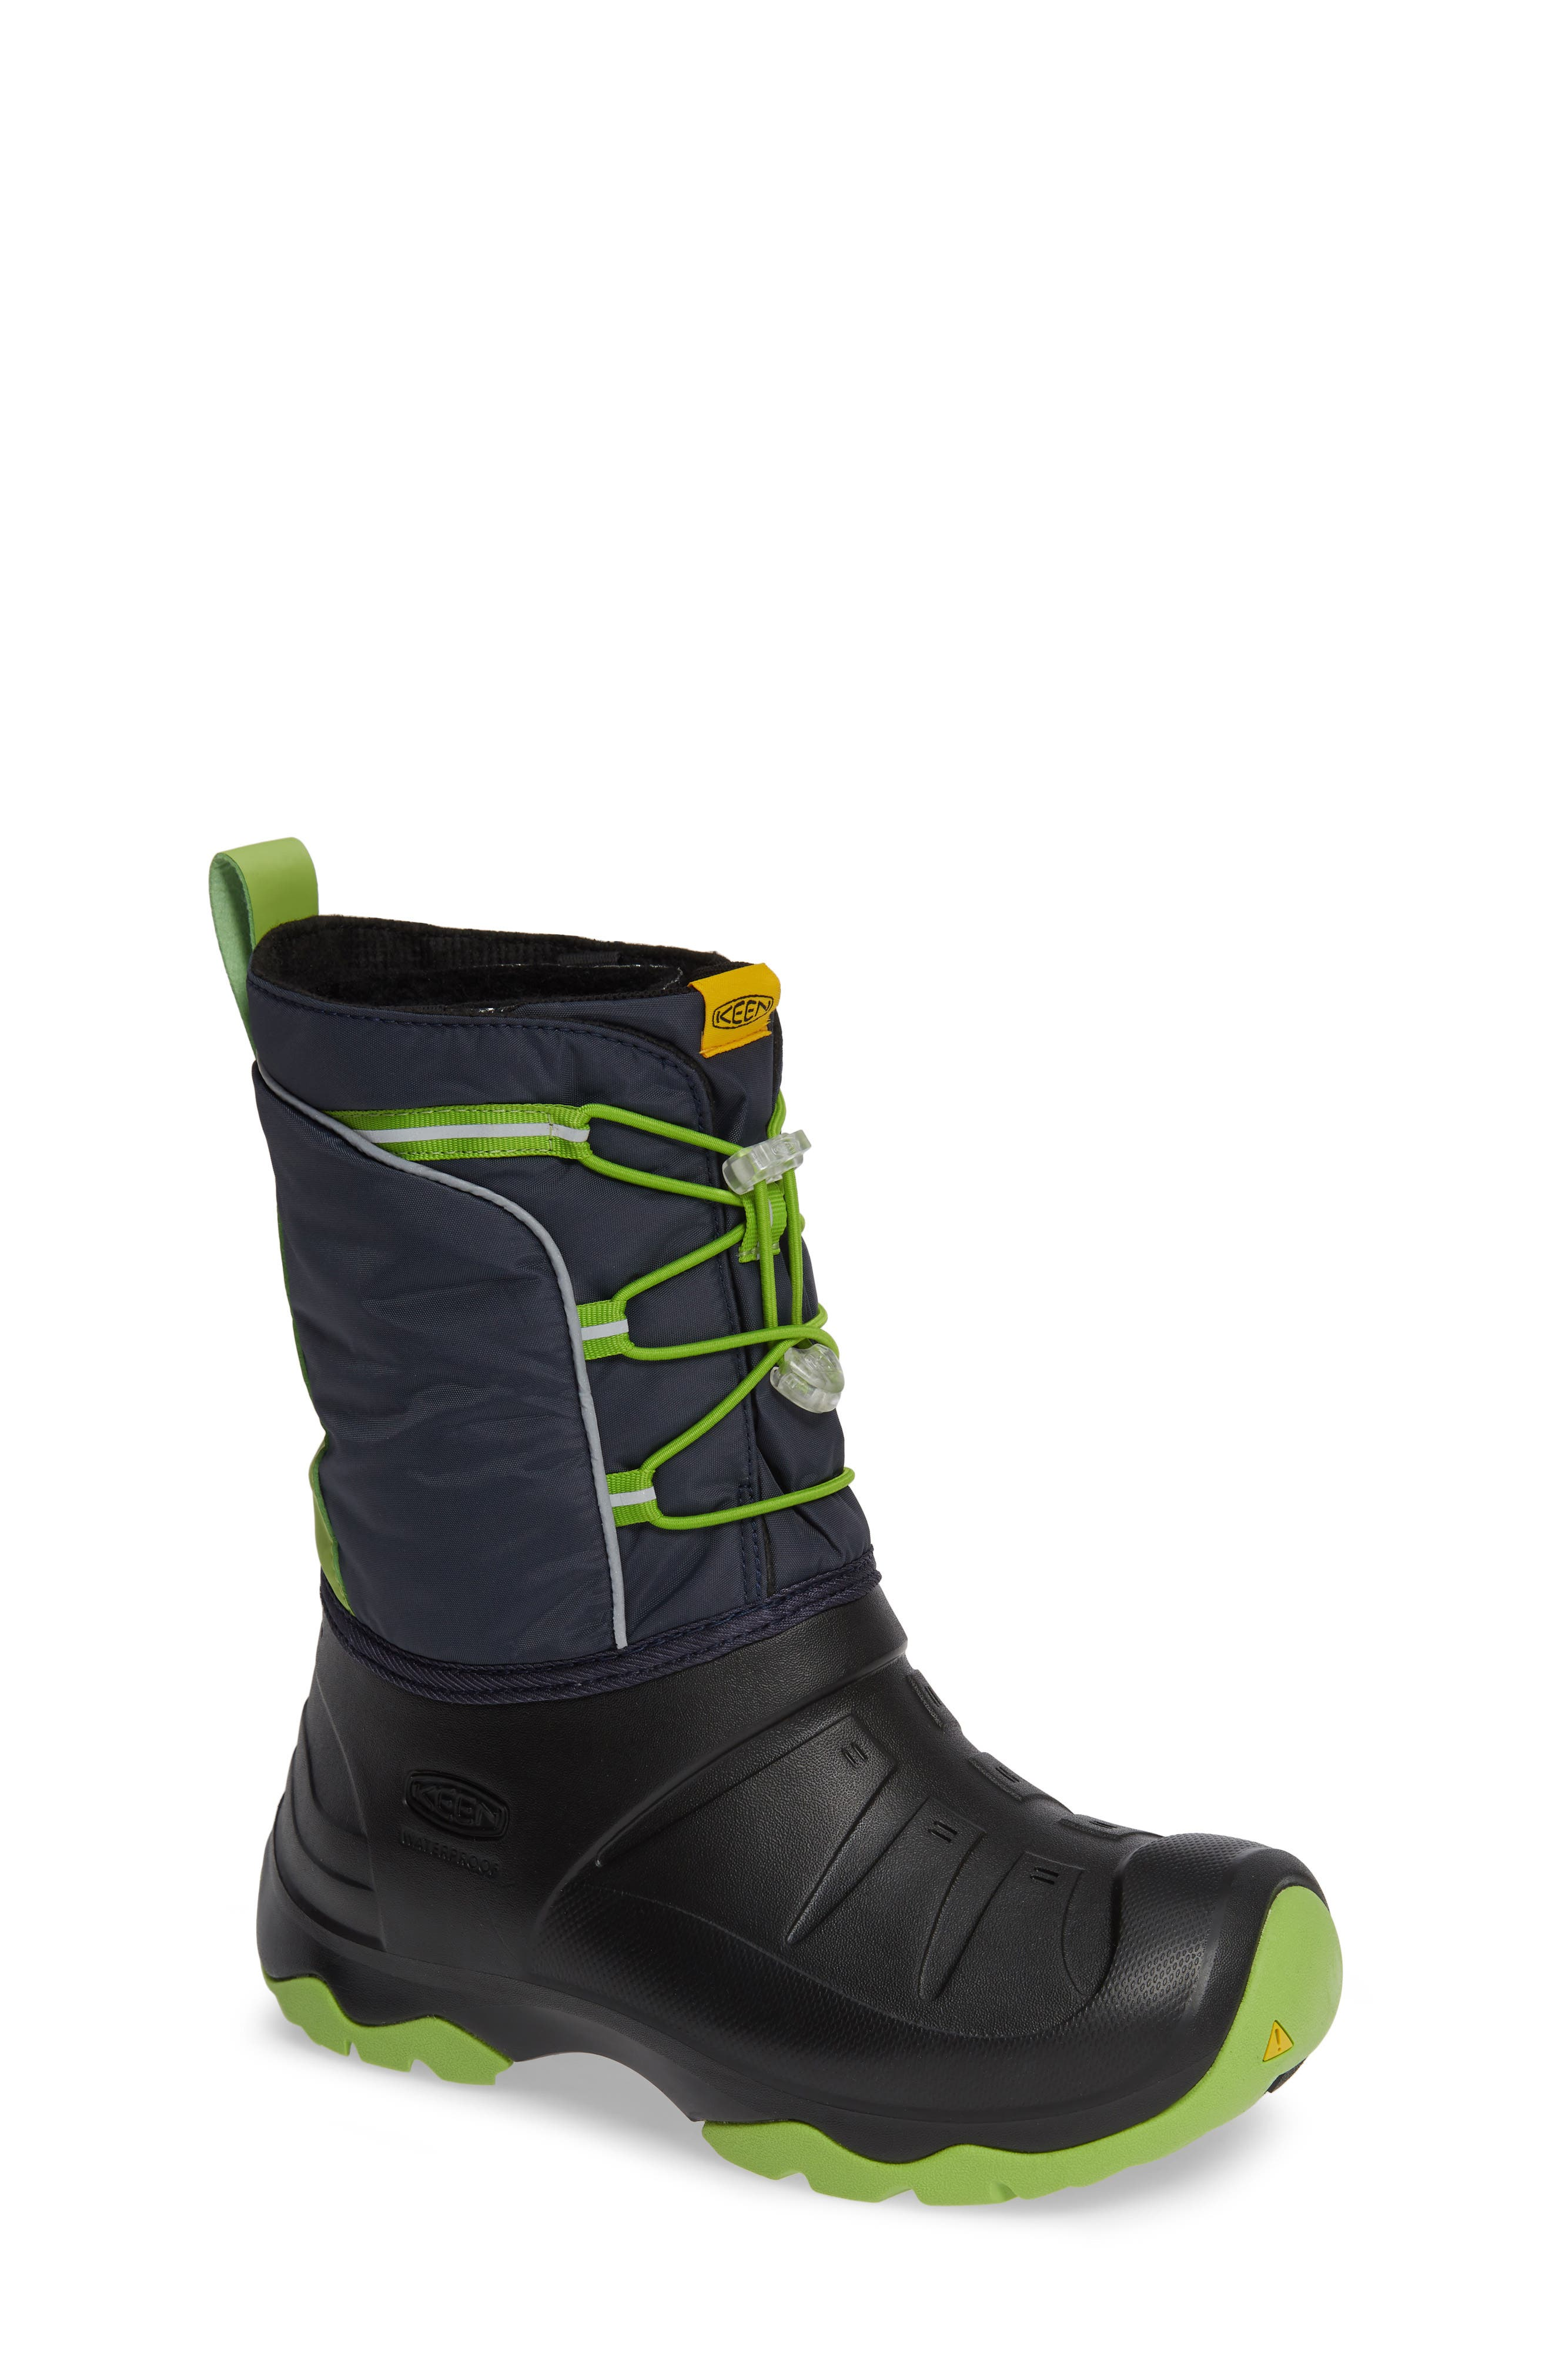 KEEN, Lumi Waterproof Boot, Main thumbnail 1, color, BLUE/ GREENERY